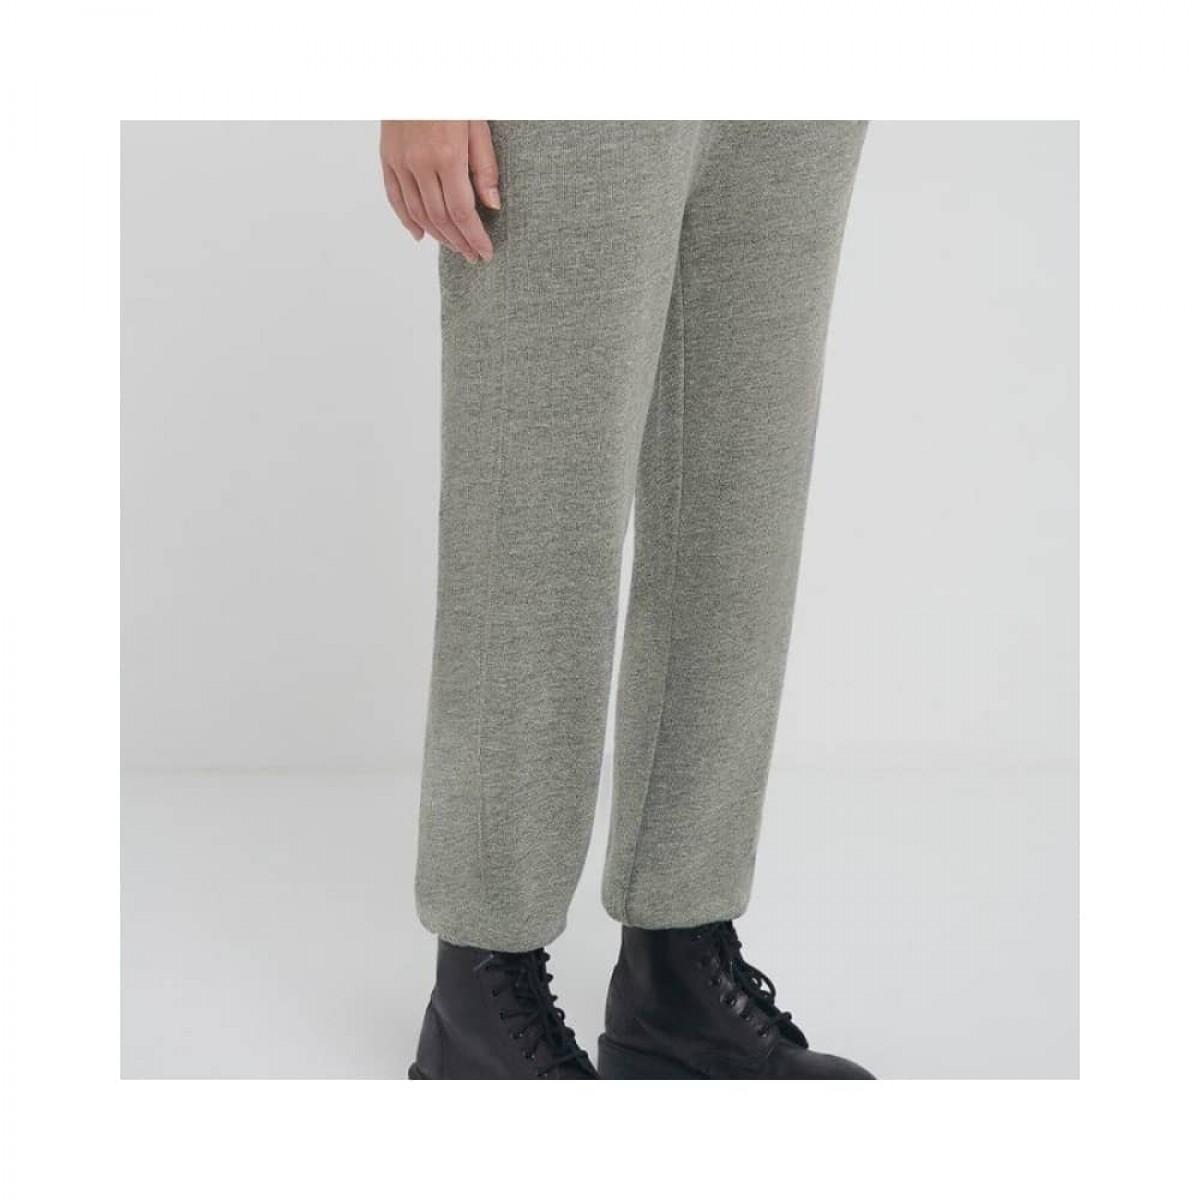 plomer sweat bukser - heather grey - model fra siden